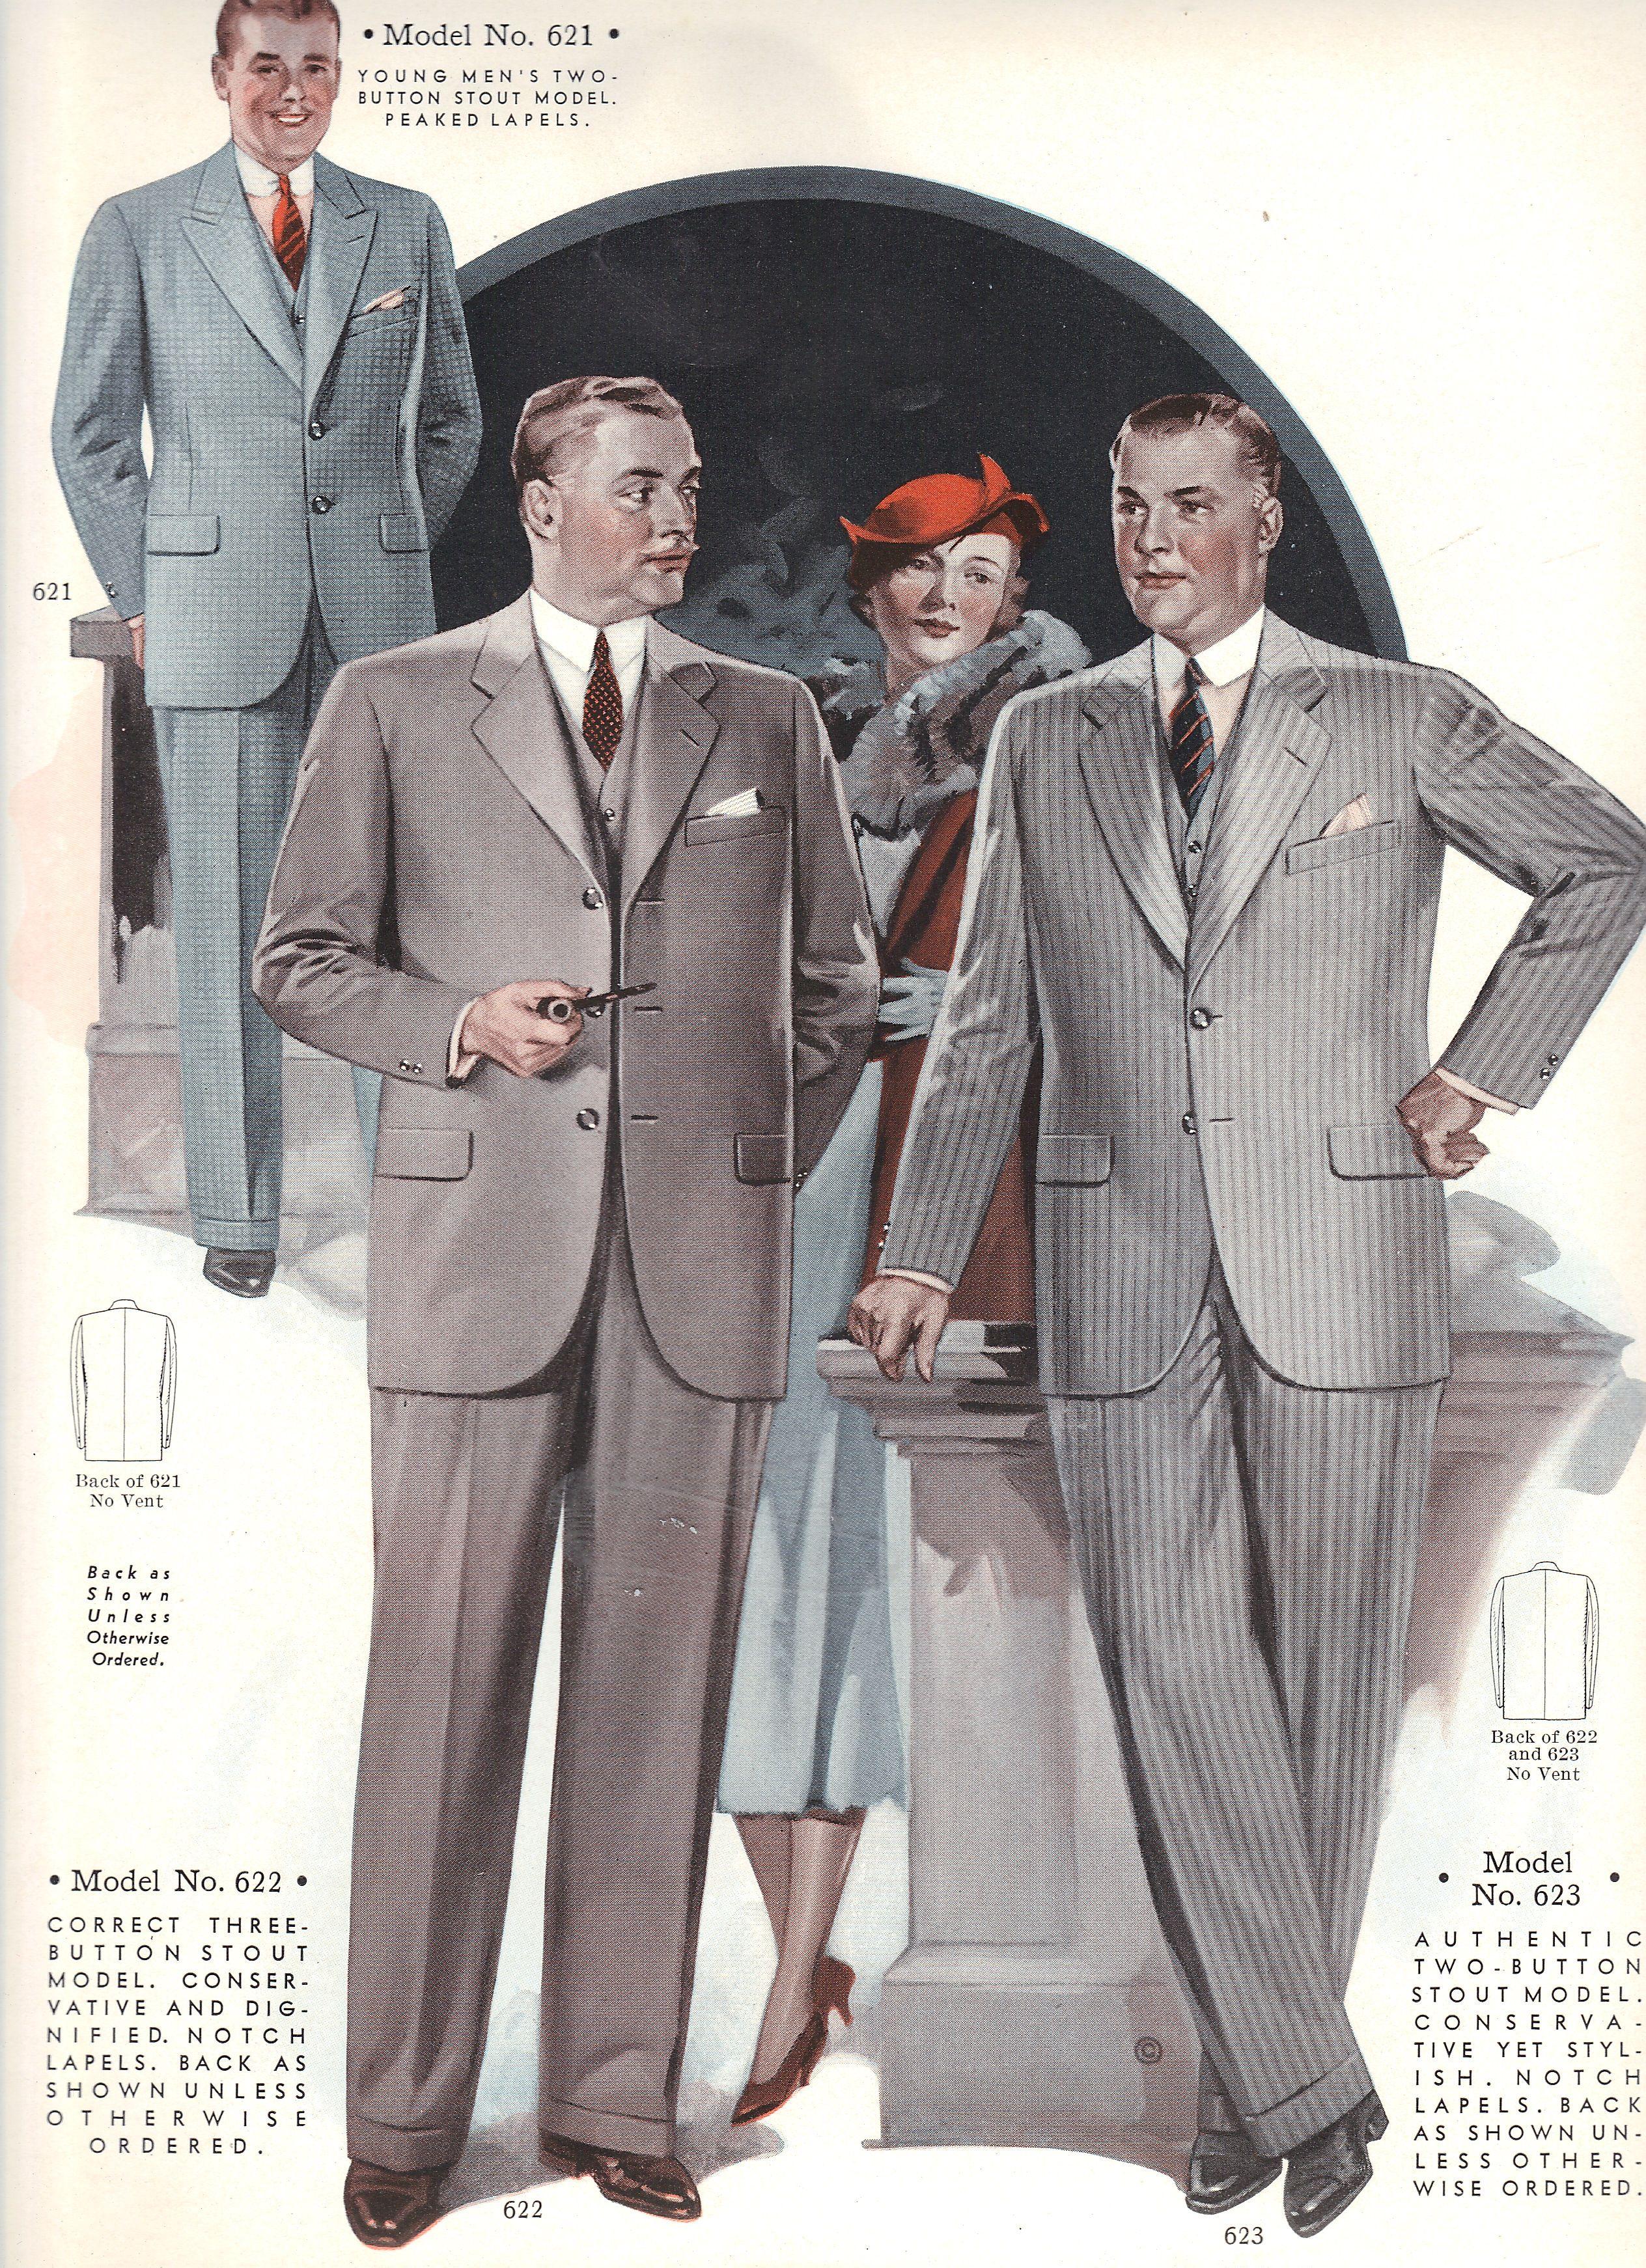 Authoritative vintage wear collection